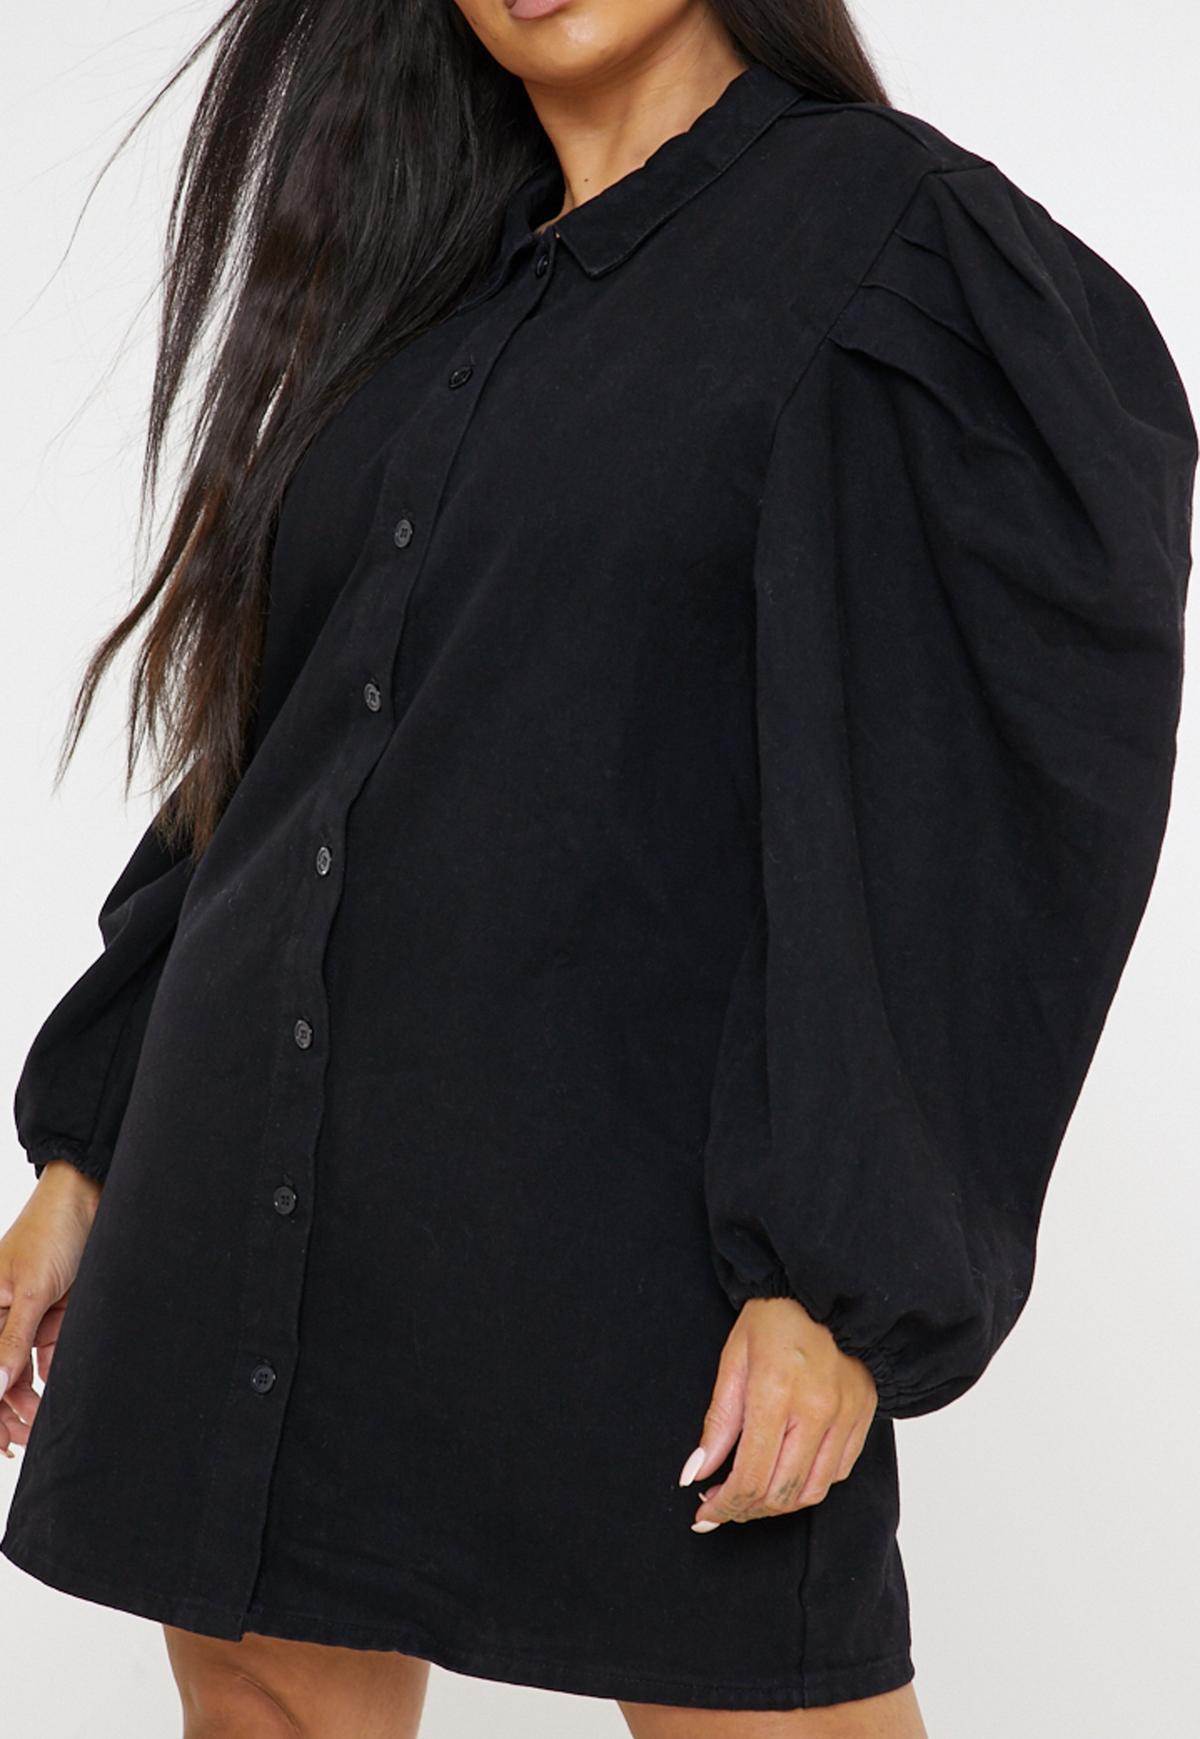 Plus Size Black Denim Puff Sleeve Shirt Dress